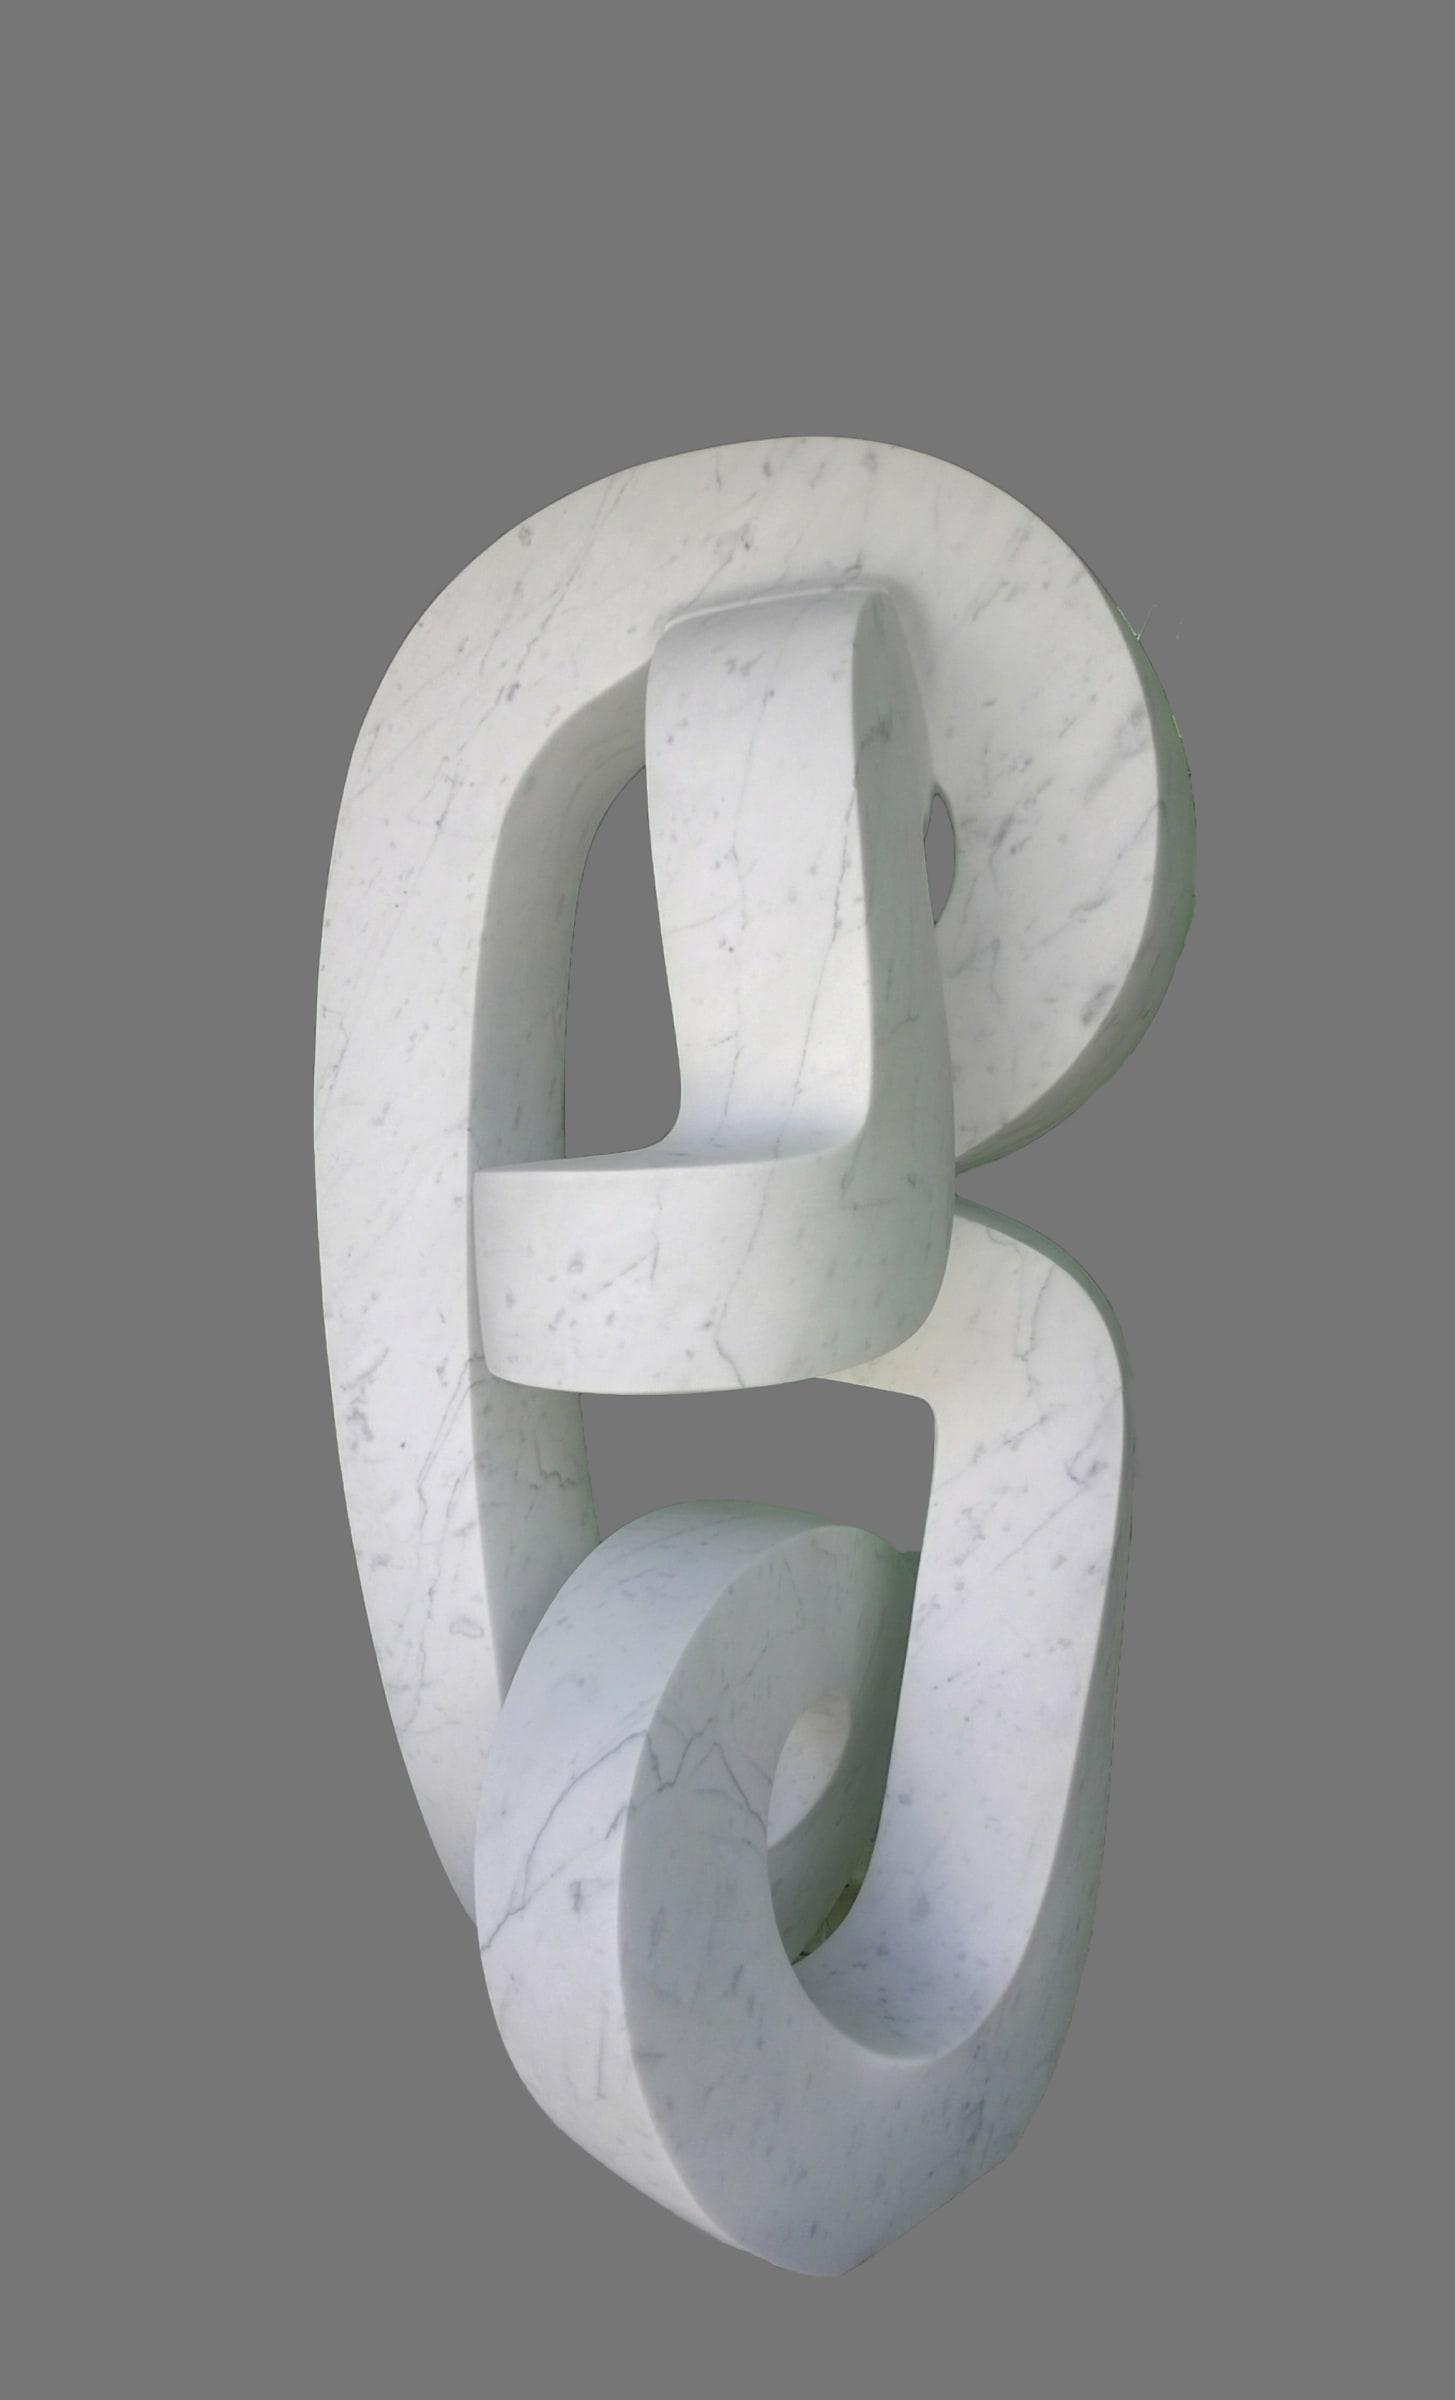 "<span class=""link fancybox-details-link""><a href=""/artists/30-paul-bloch/works/290-paul-bloch-adagio/"">View Detail Page</a></span><div class=""artist""><strong>Paul Bloch</strong></div> <div class=""title""><em>Adagio</em></div> <div class=""medium"">Carrara Marble</div> <div class=""dimensions"">39 x 20.5 x 20.5 inches <br /> SOLD<br /> </div>"